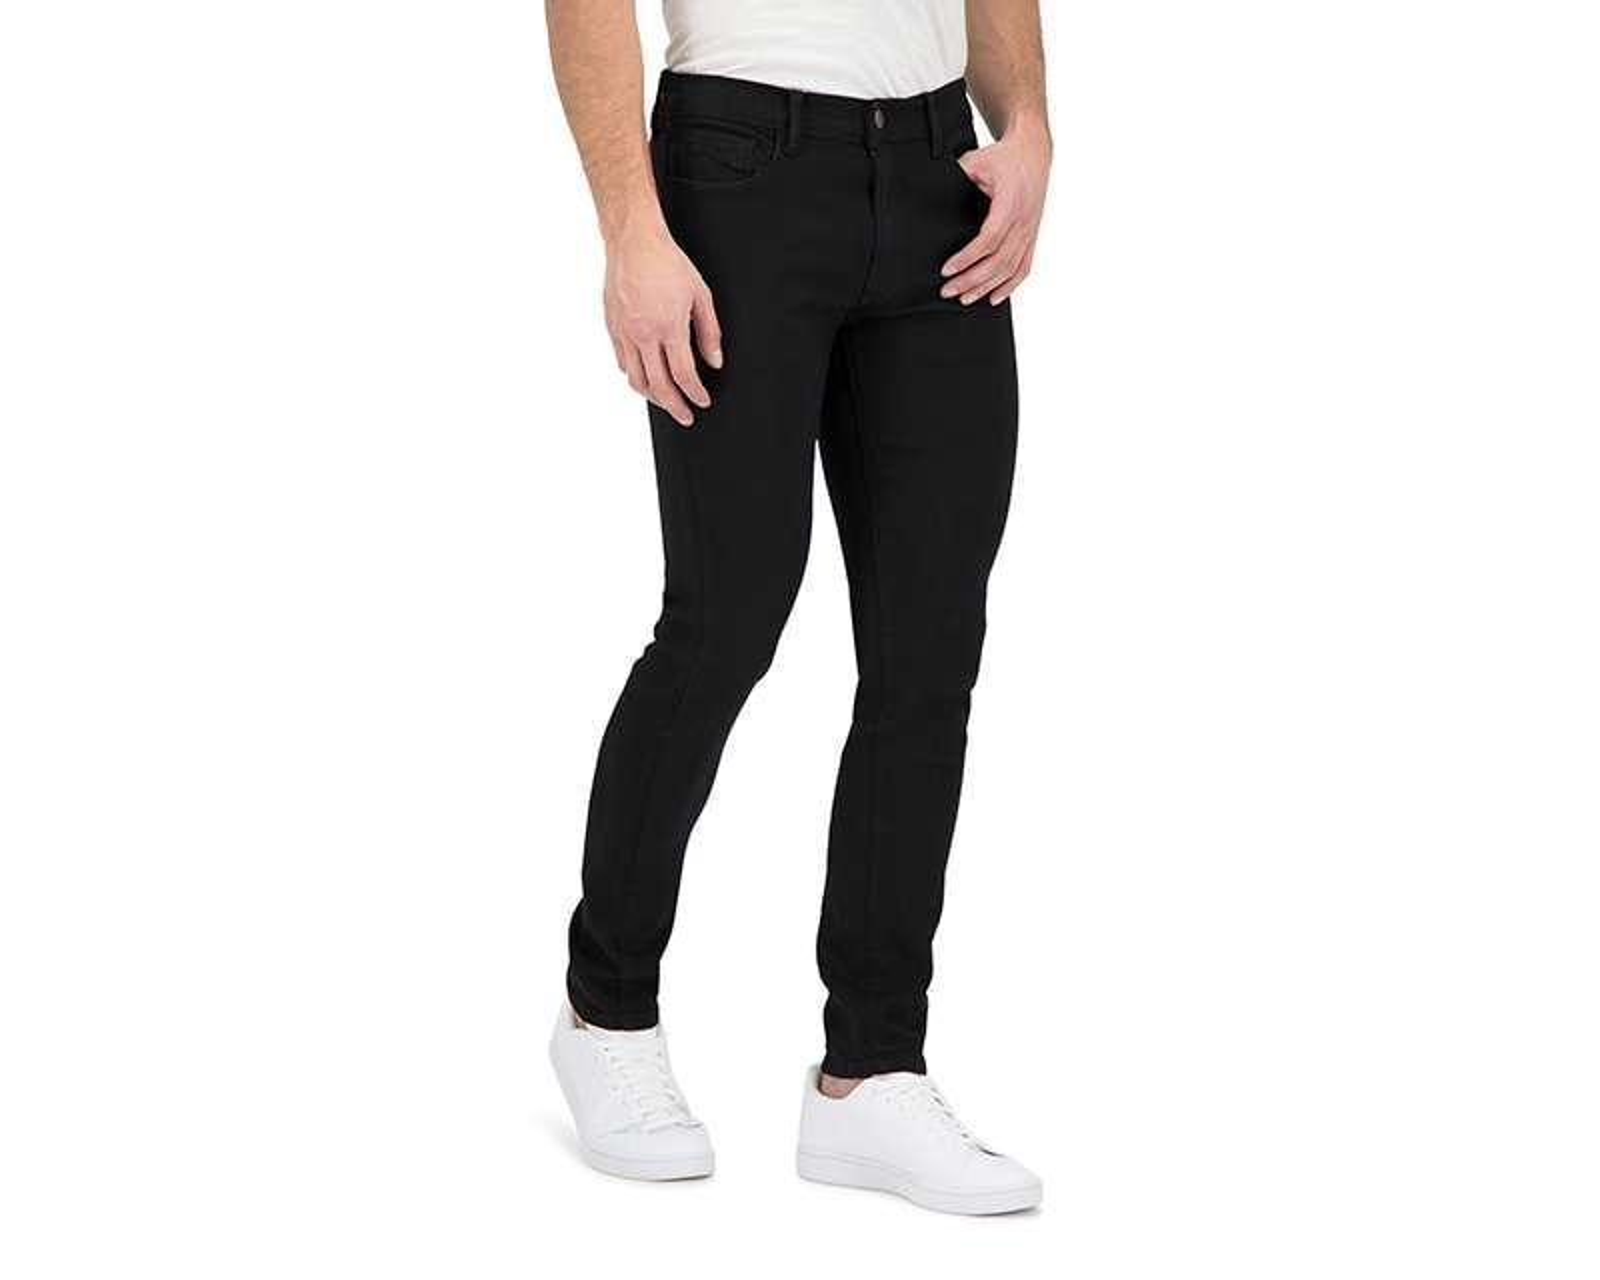 Foto 1|Pantalón Skinny marca Lucky Star para Hombre